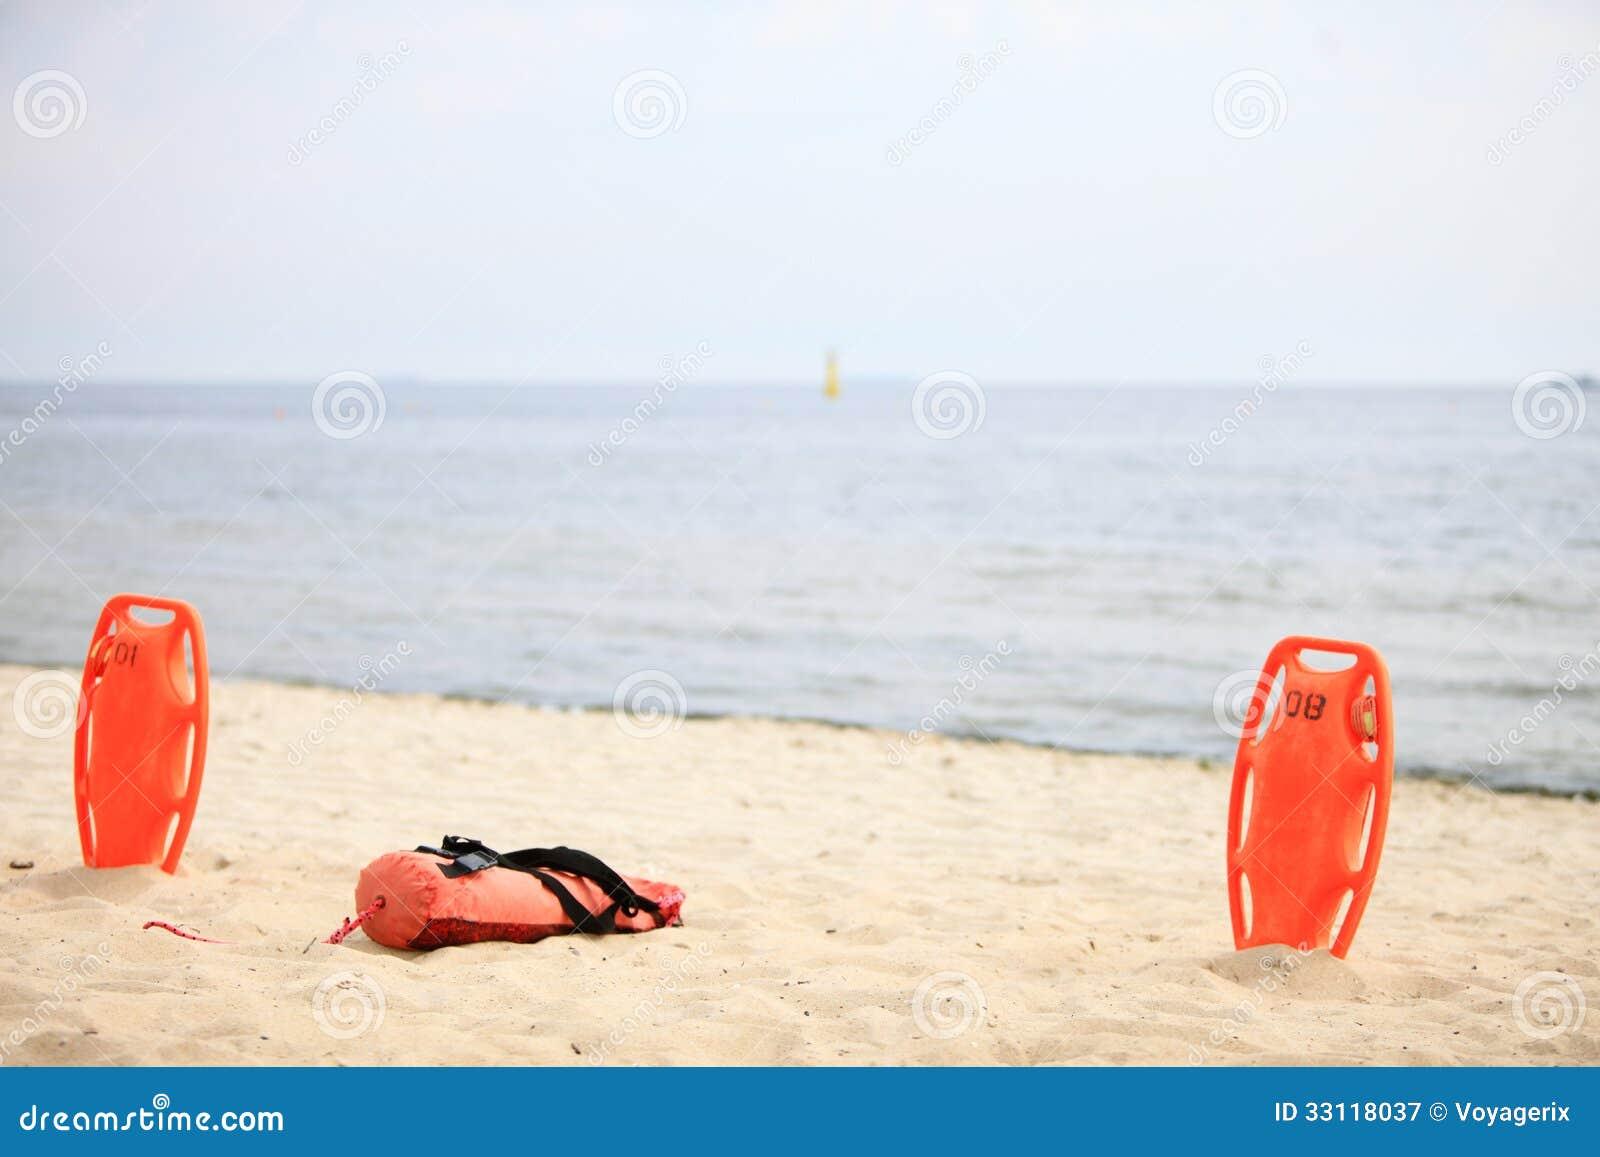 Lifeguard Beach Rescue Equipment Royalty Free Stock